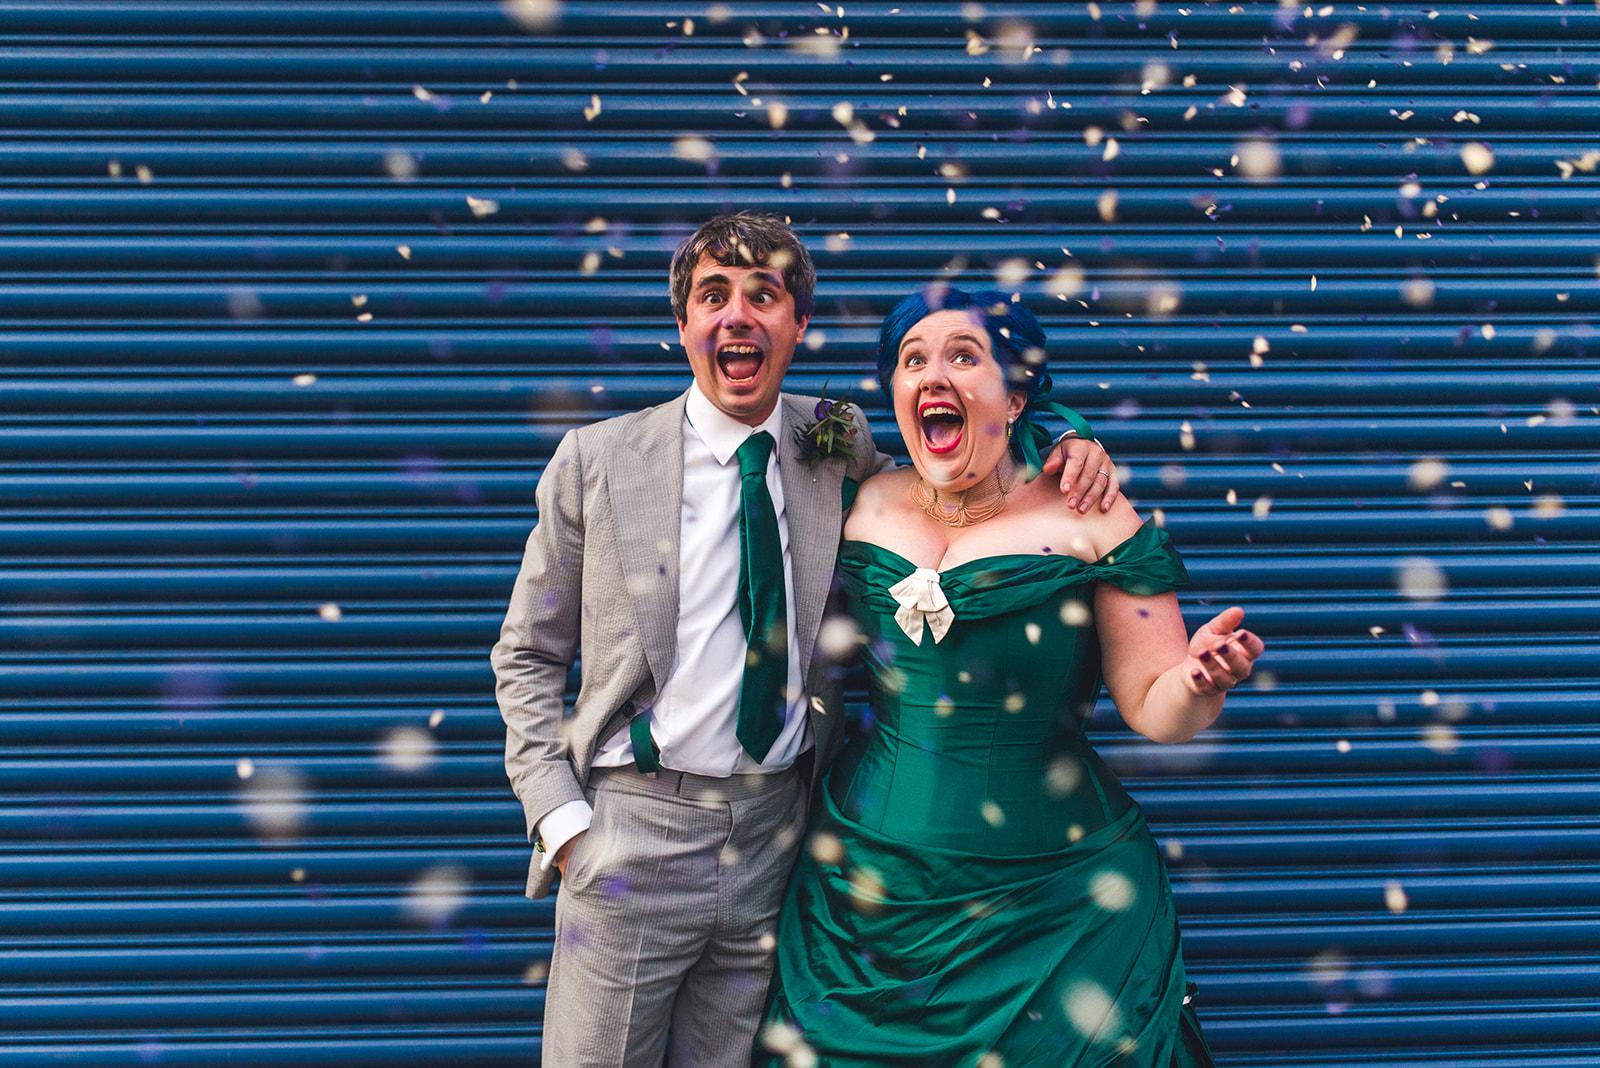 fun wedding day - unique wedding ideas - unconventional wedding